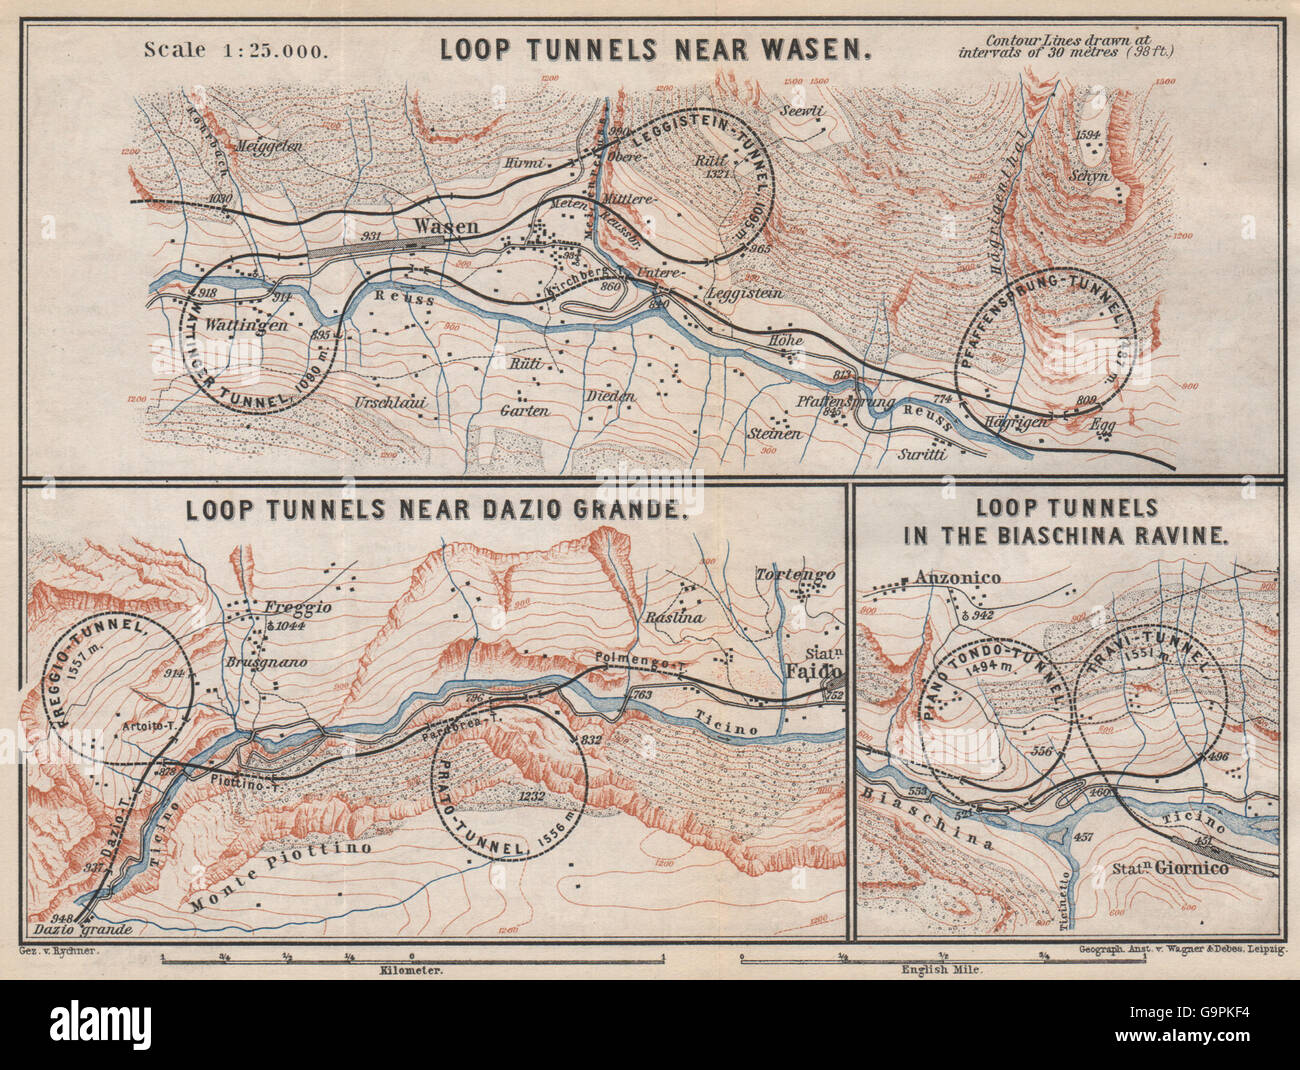 ST GOTTHARD RAILWAY SPIRAL/LOOP TUNNELS Wassen Freggio Prato Biaschina, 1889 map Stock Photo